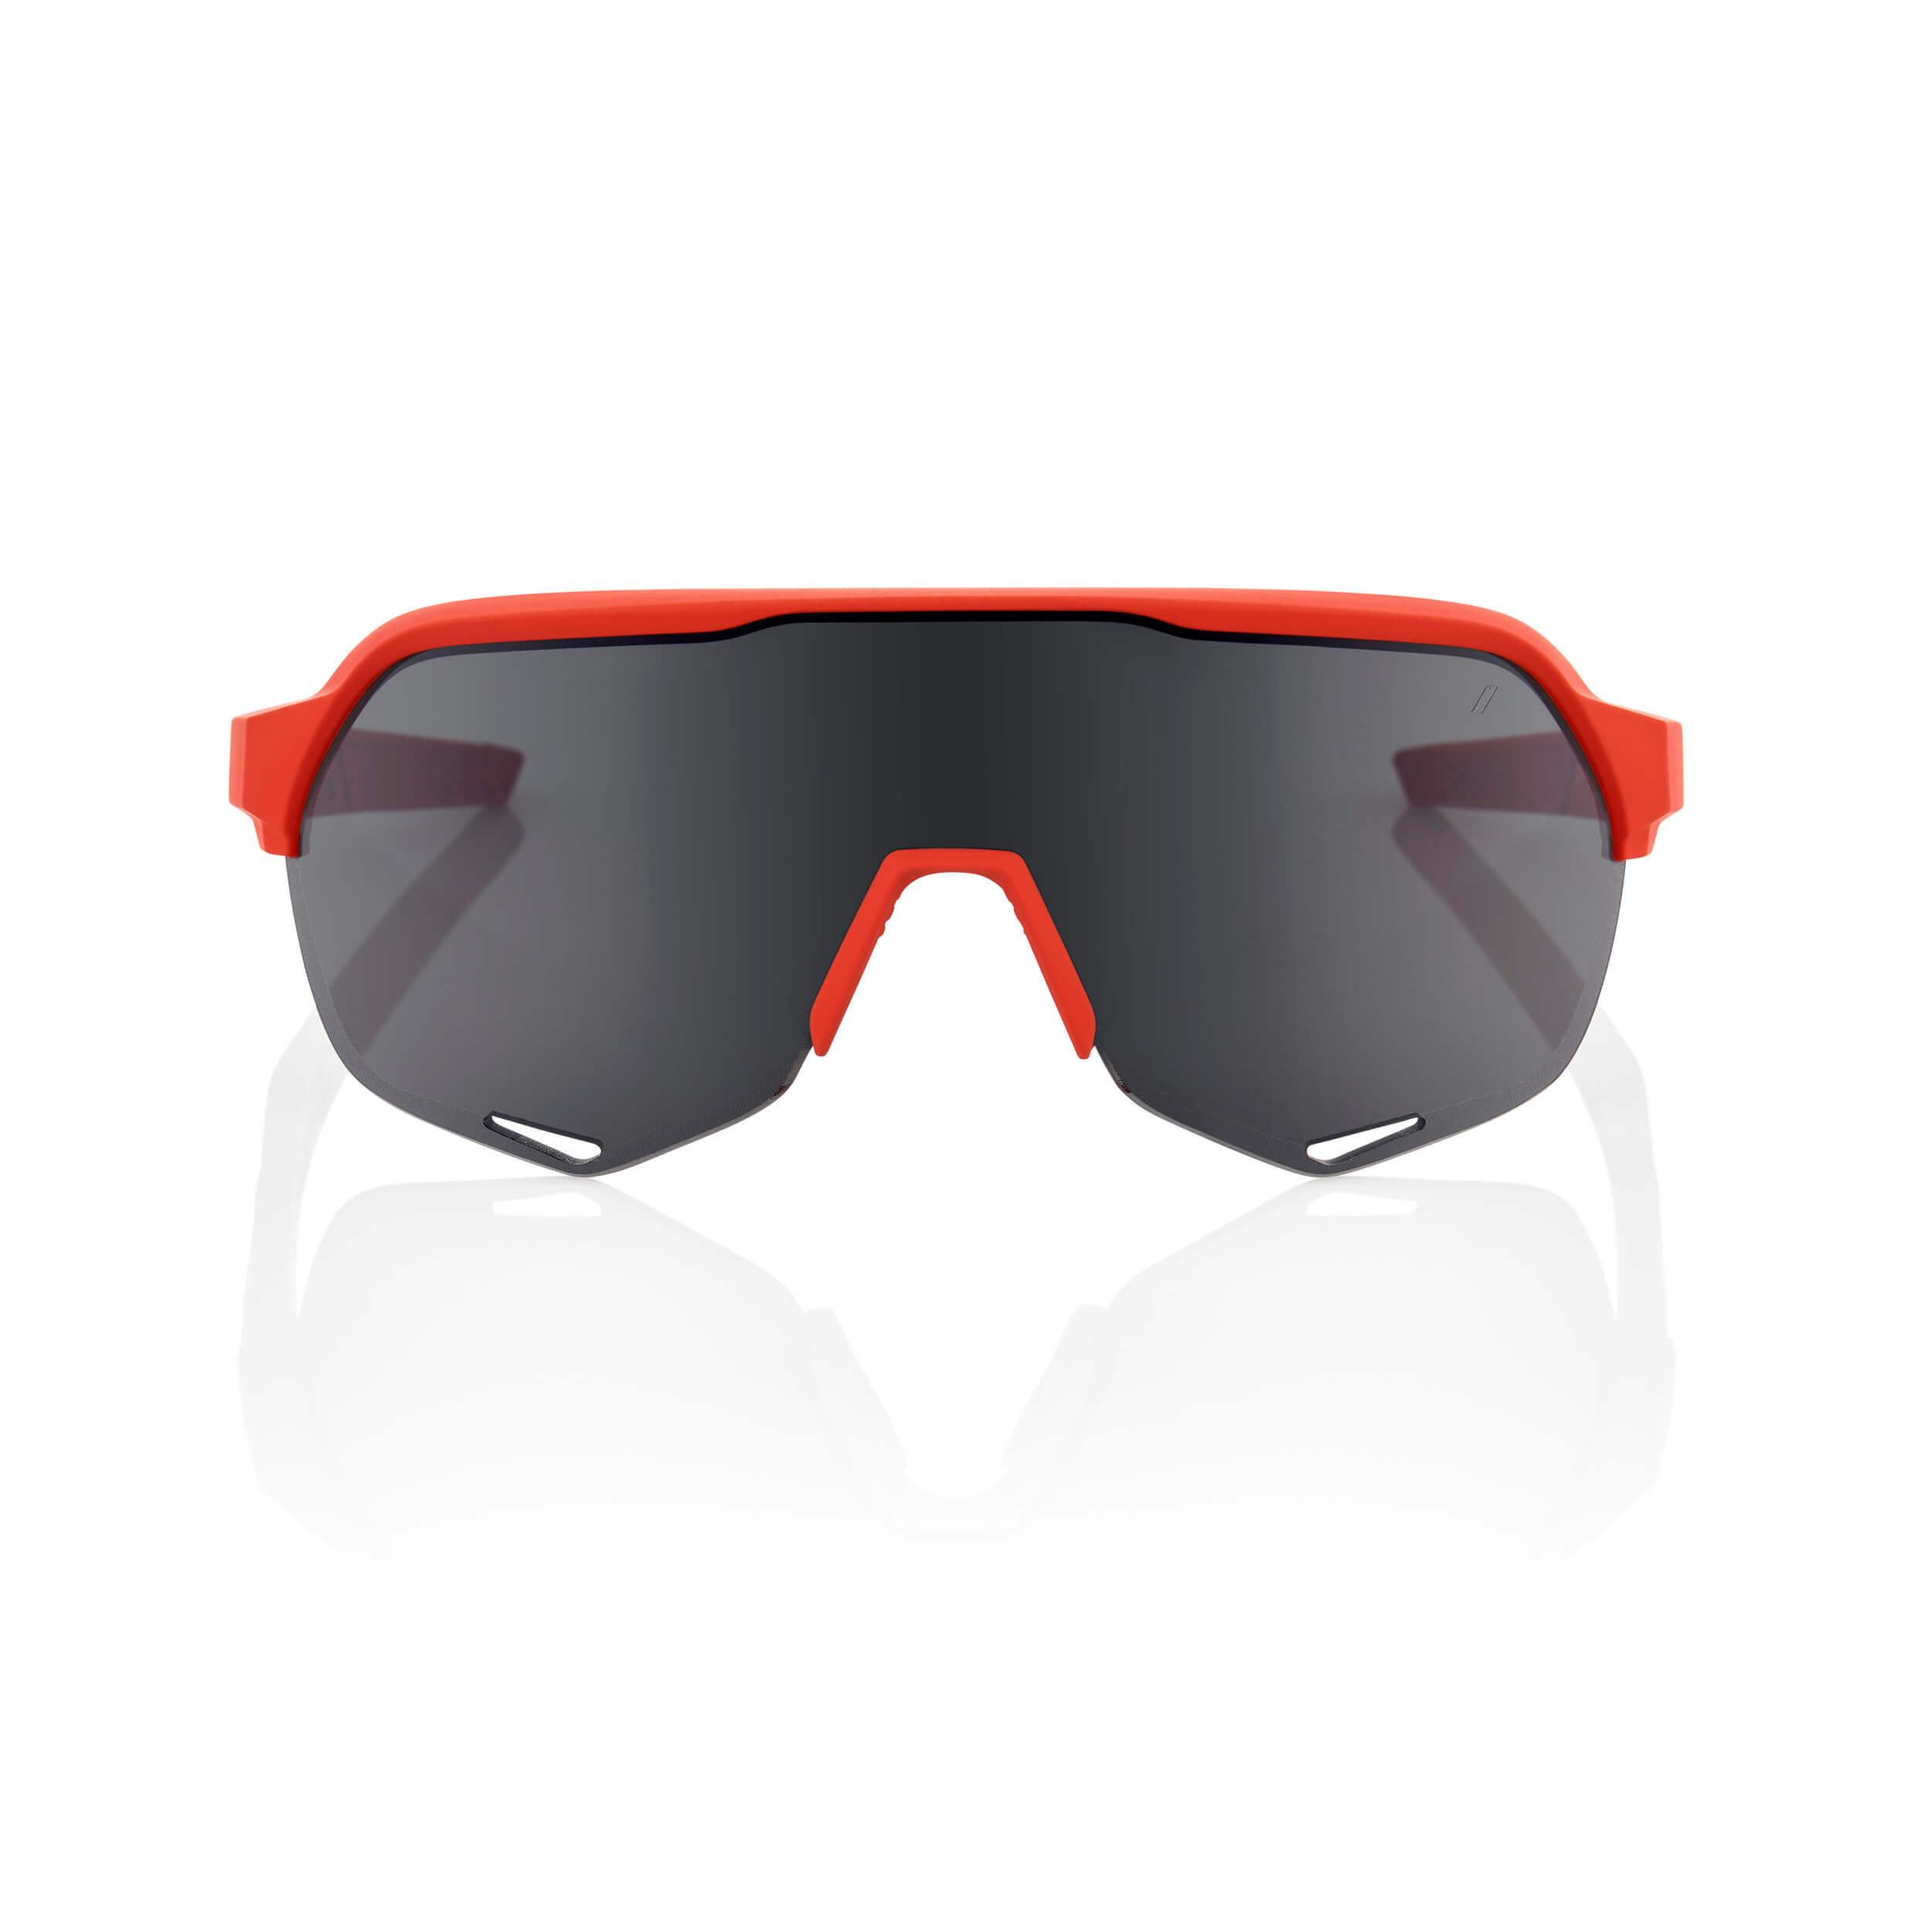 S2 – Soft Tact Coral – Smoke Lens